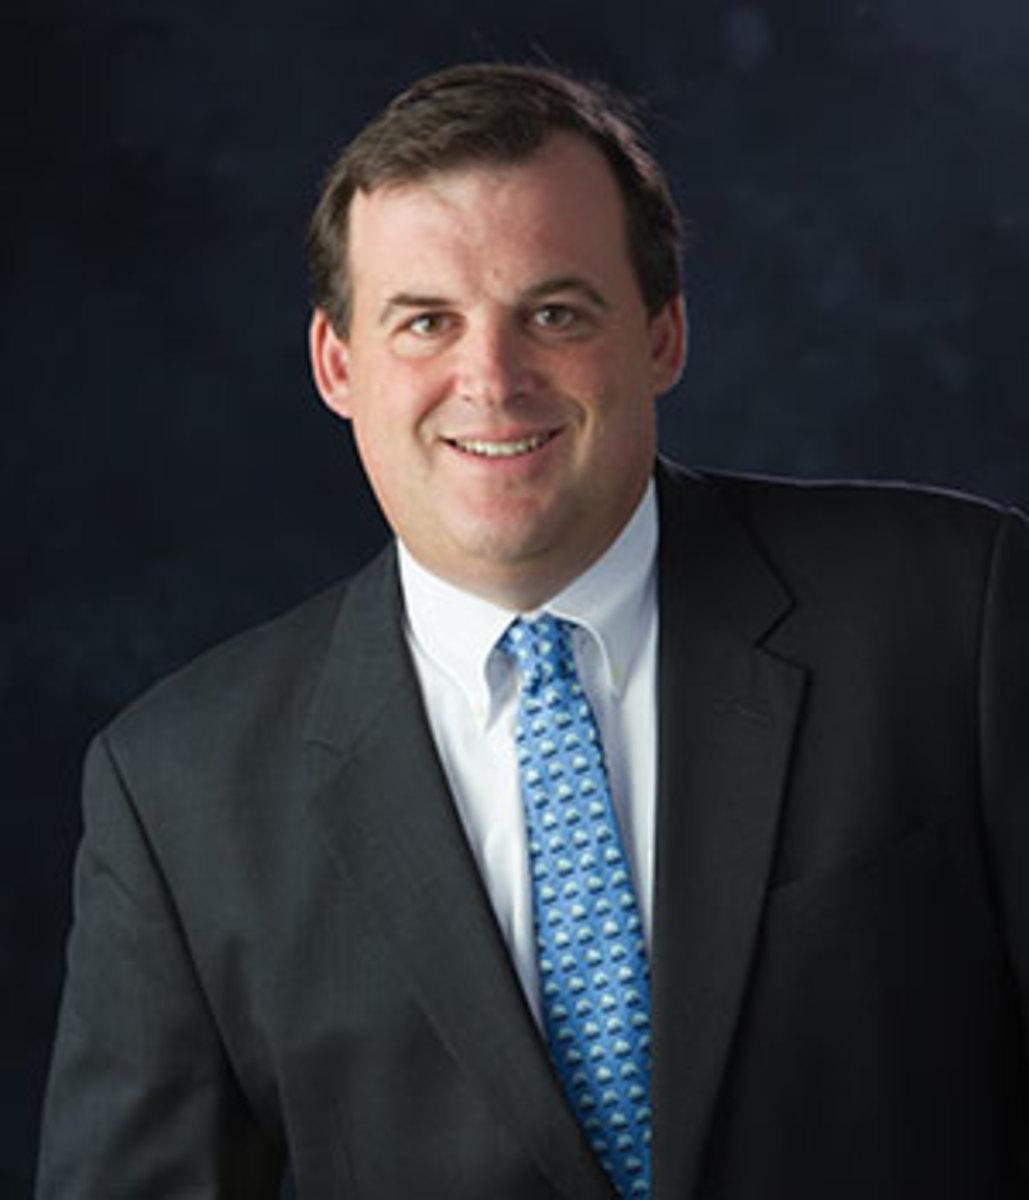 Jim Werner